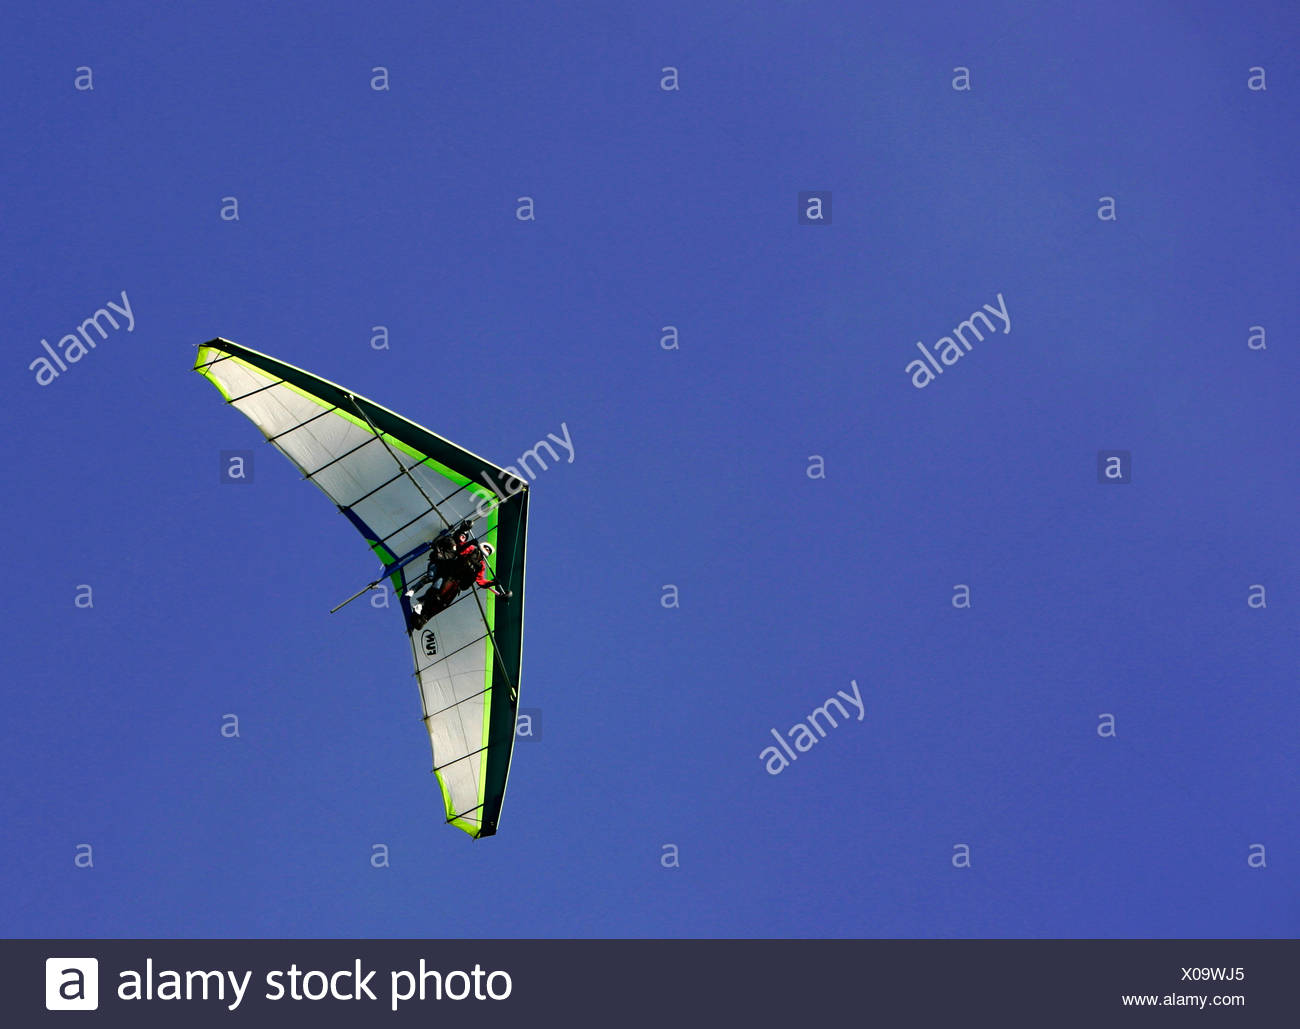 Tandem - hang glider pilot - Stock Image